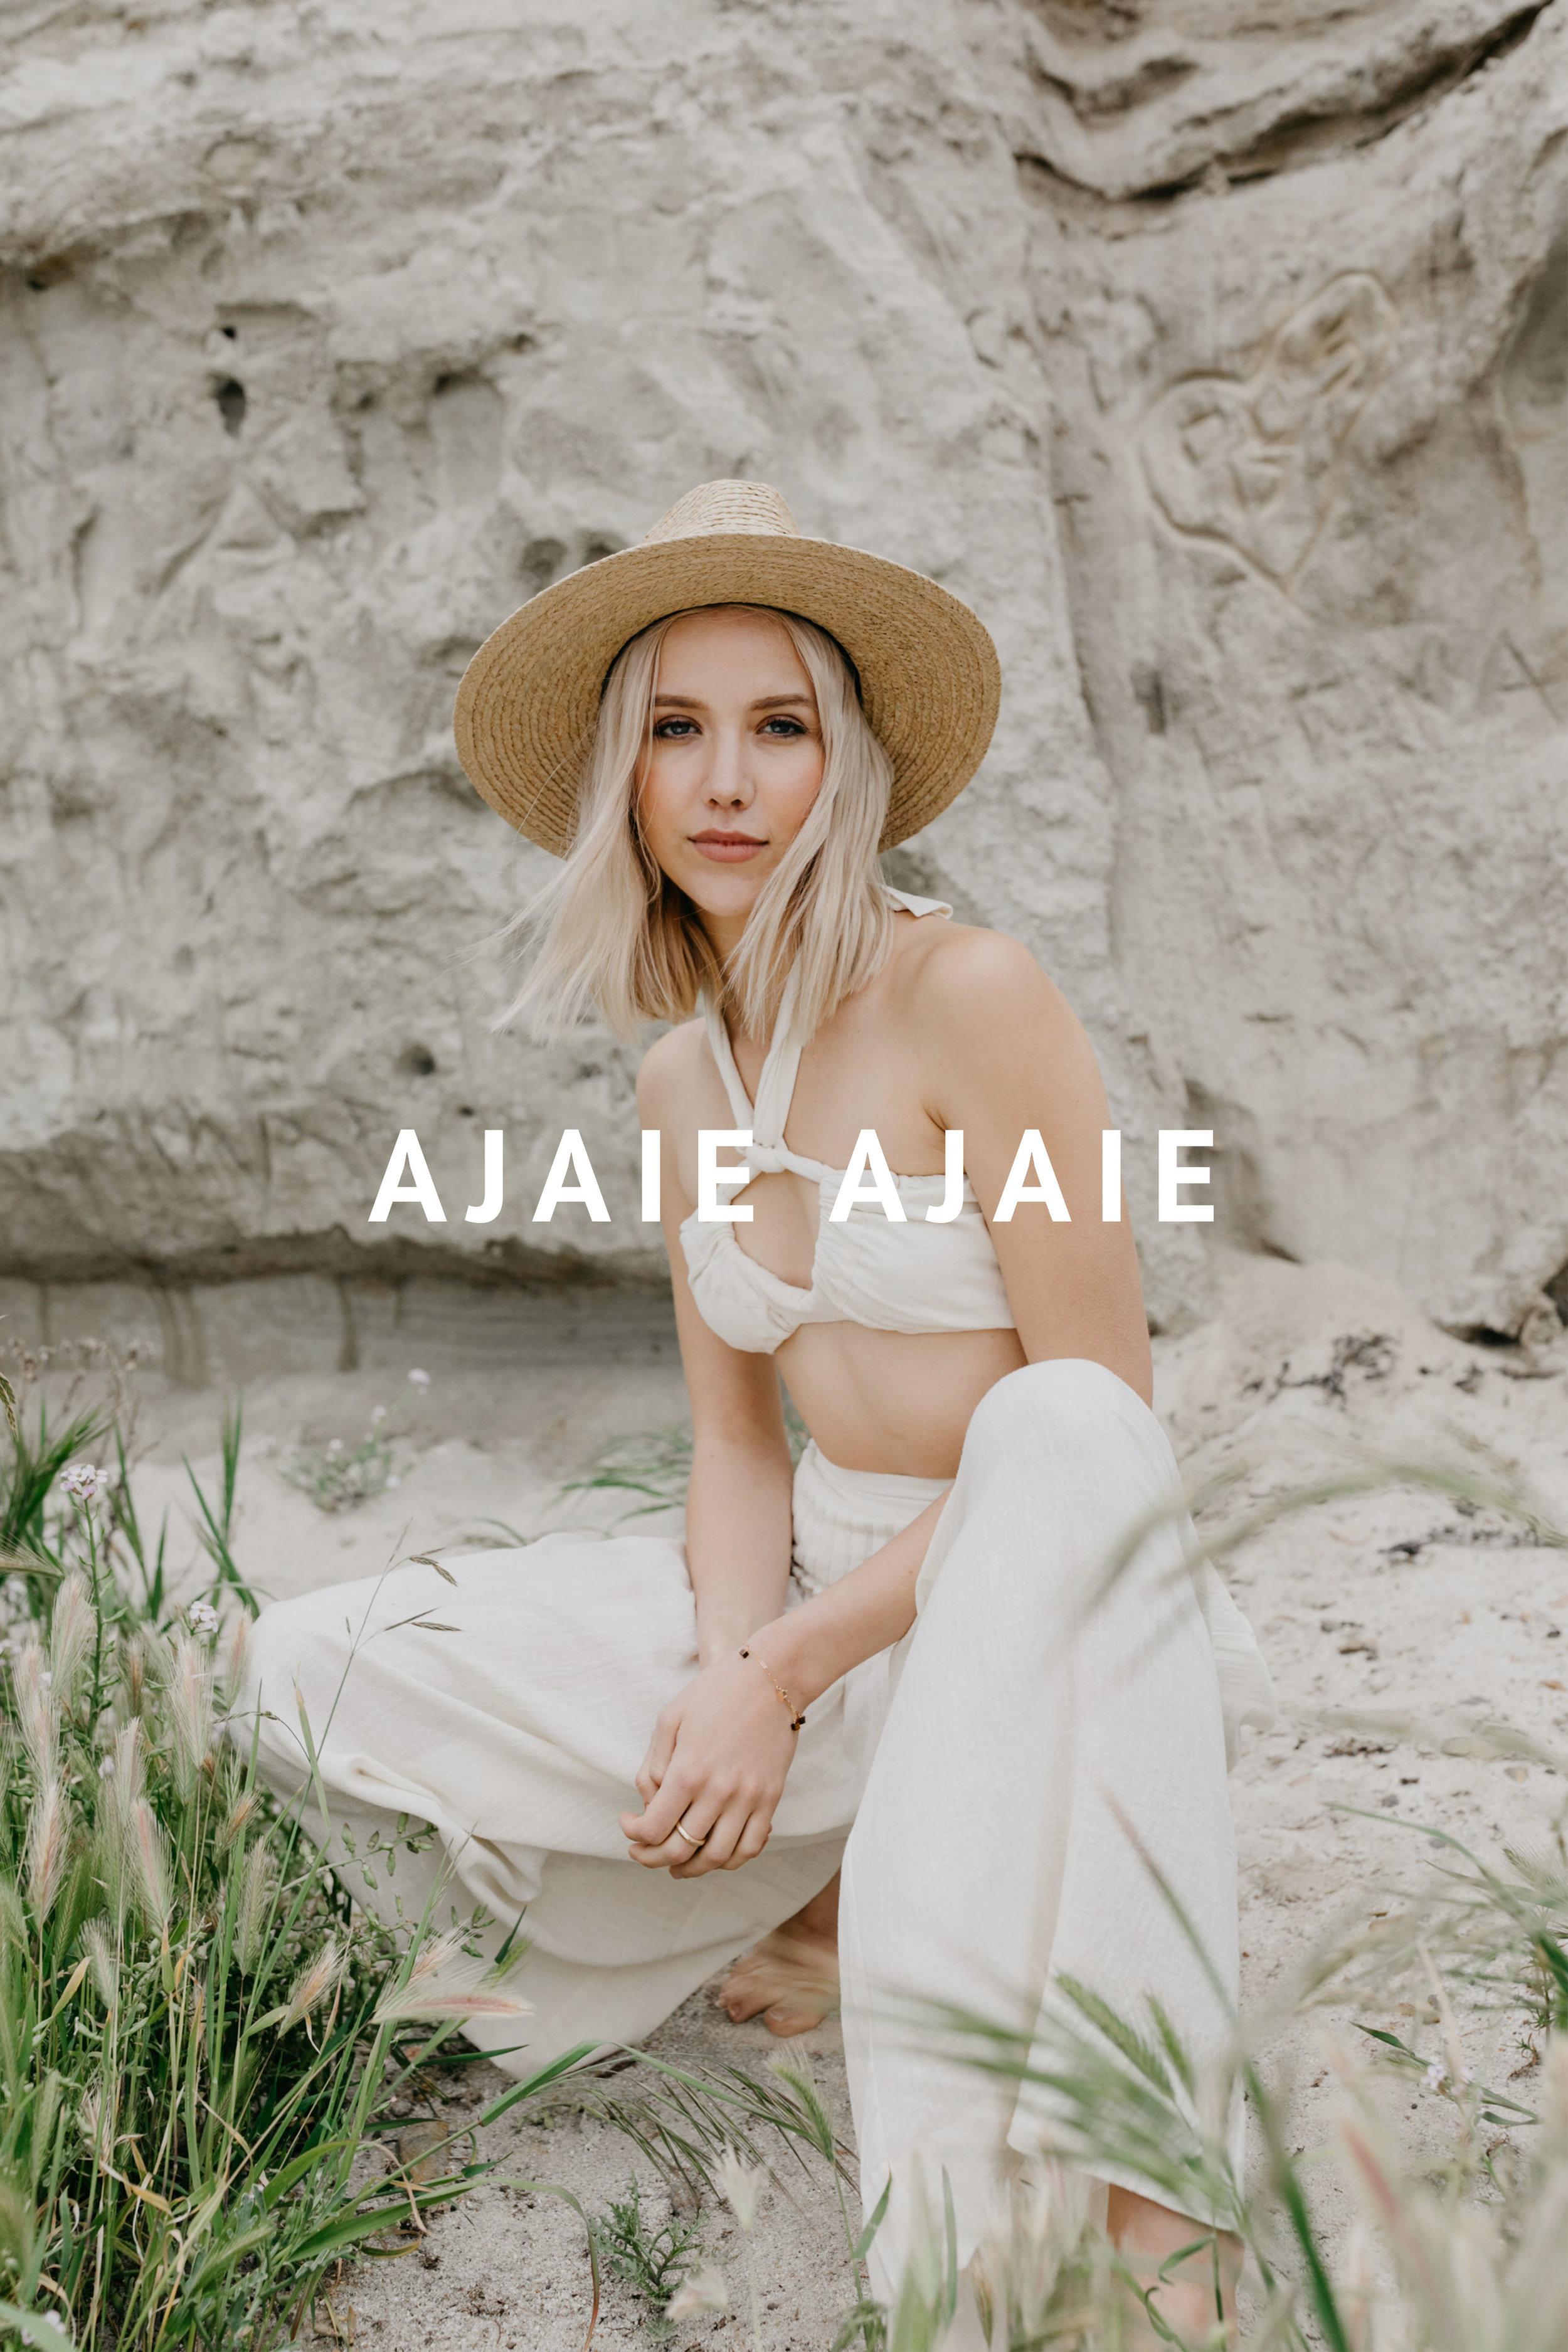 Fashion Icons-Ajaie Ajaie.jpg